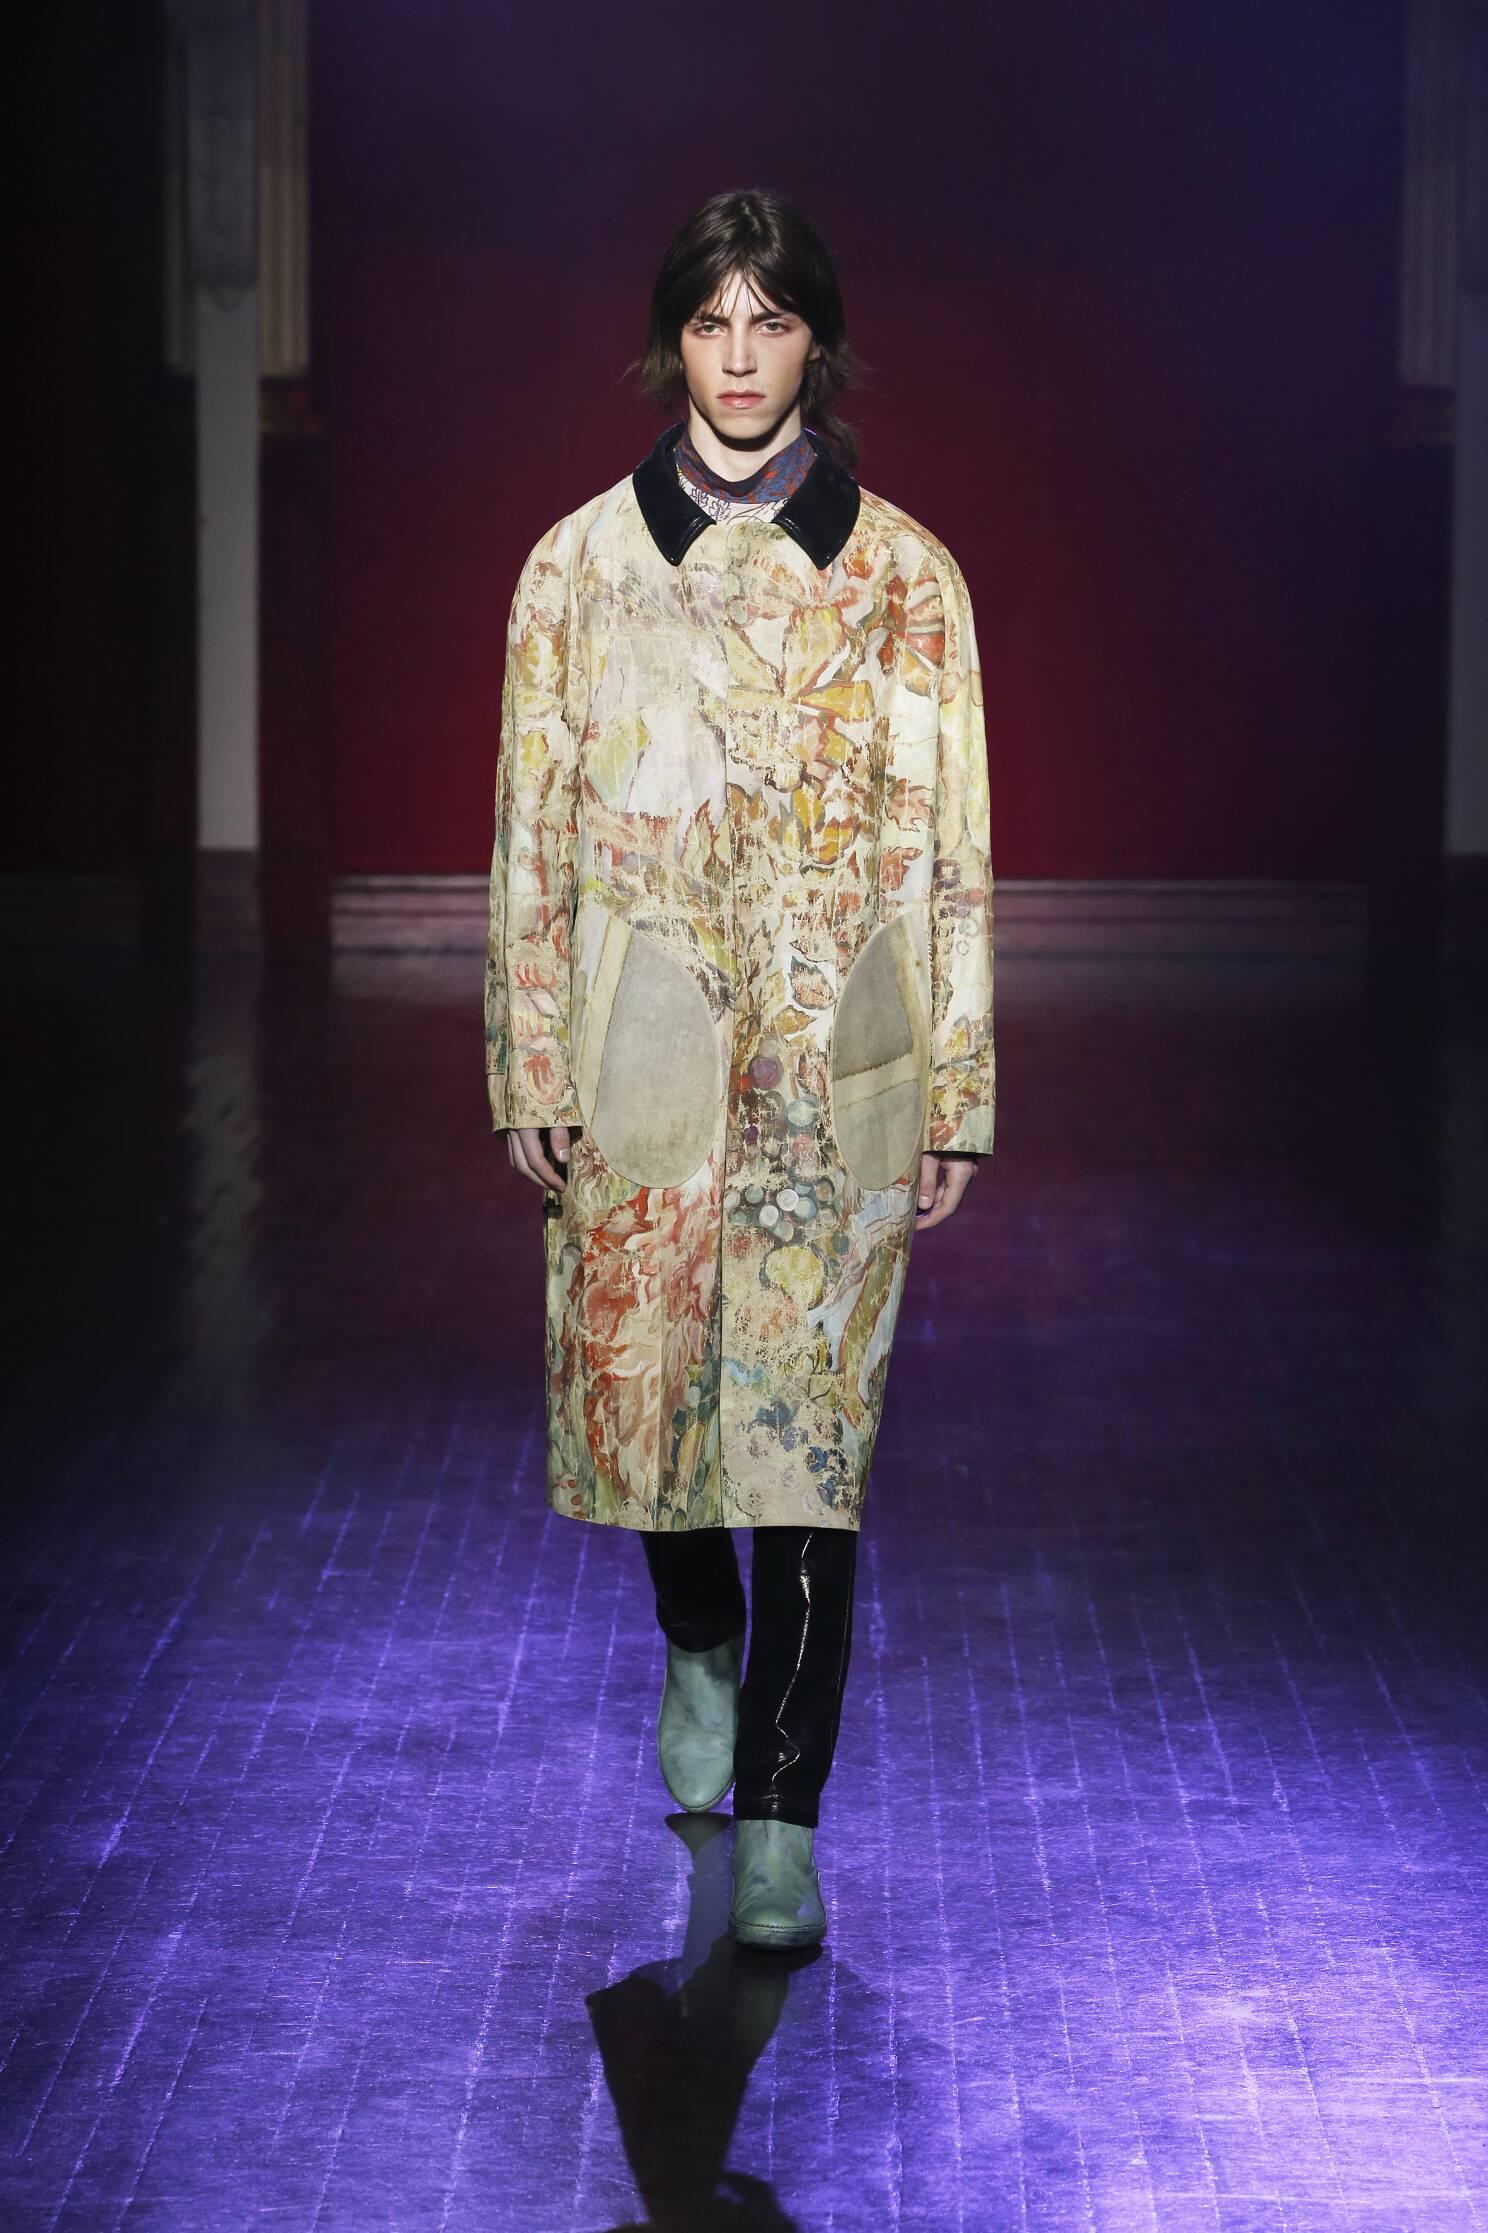 Catwalk Maison Margiela Collection Fashion Show Winter 2015